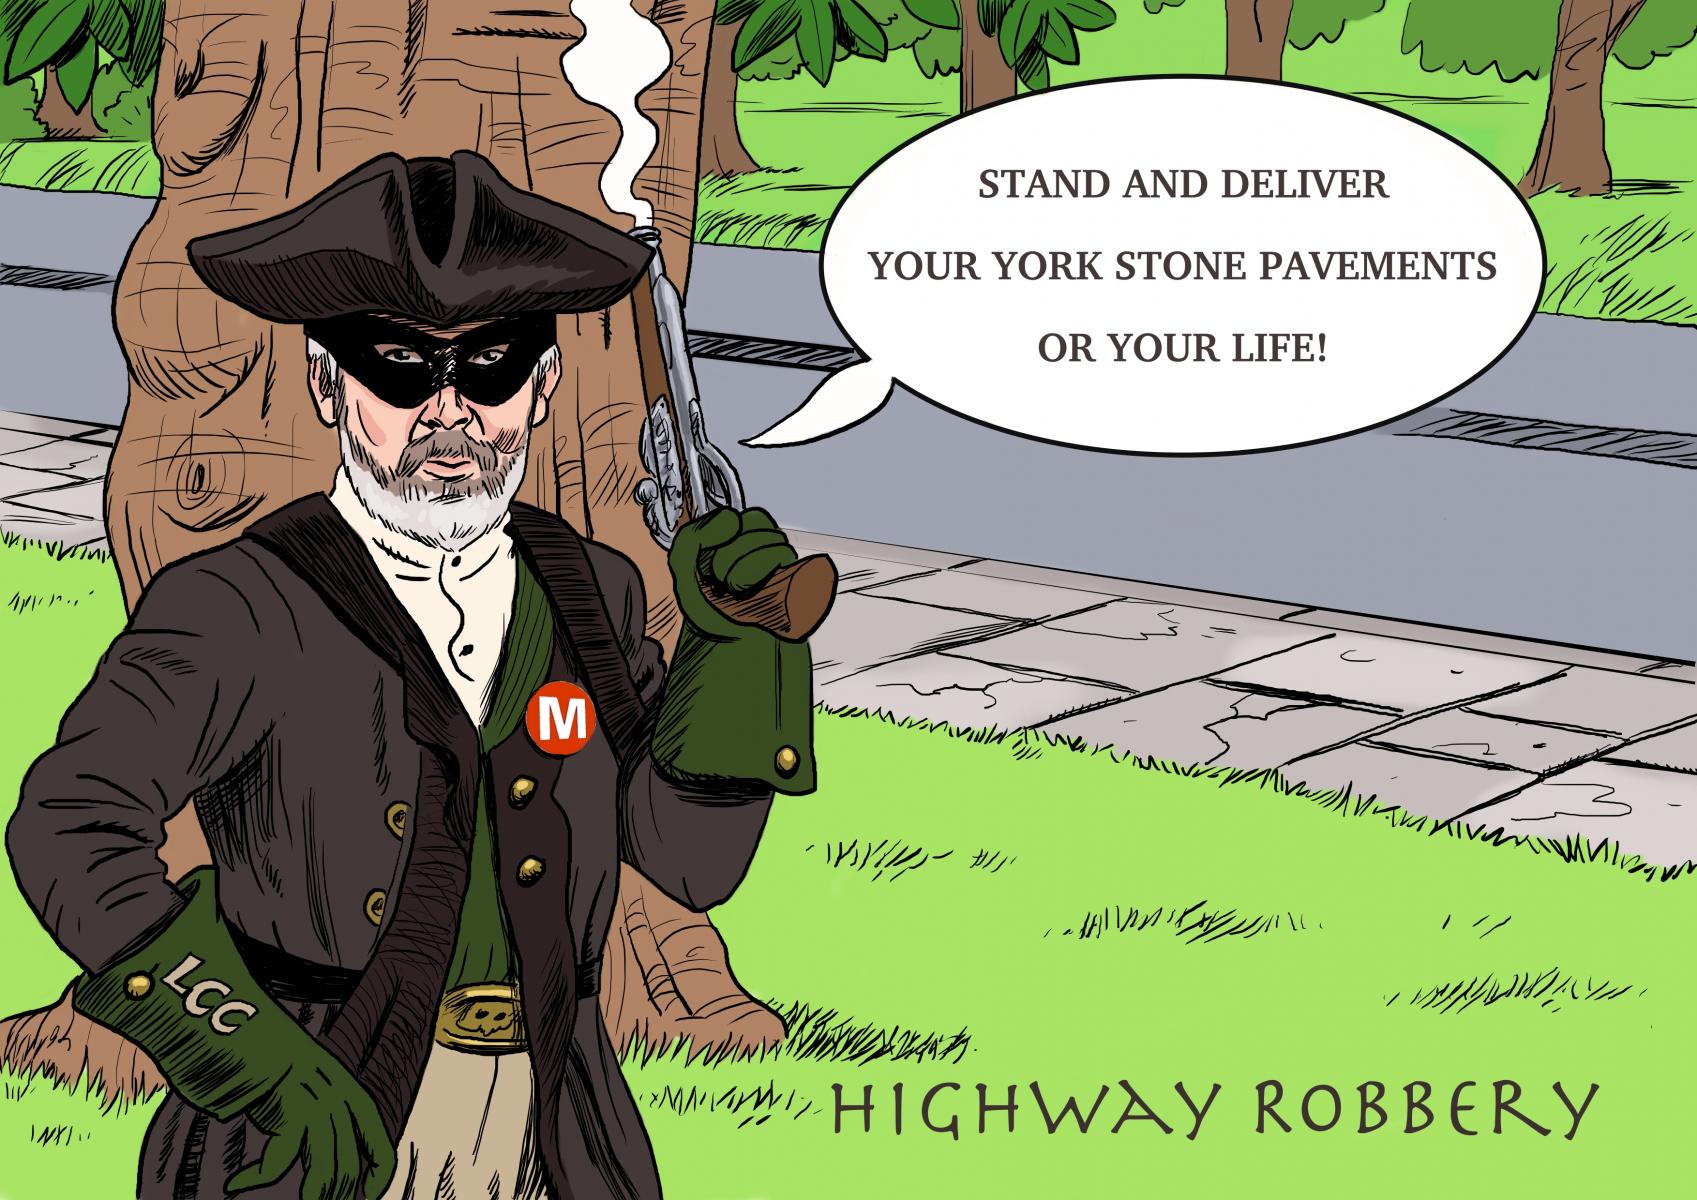 Highwayman-cartoon